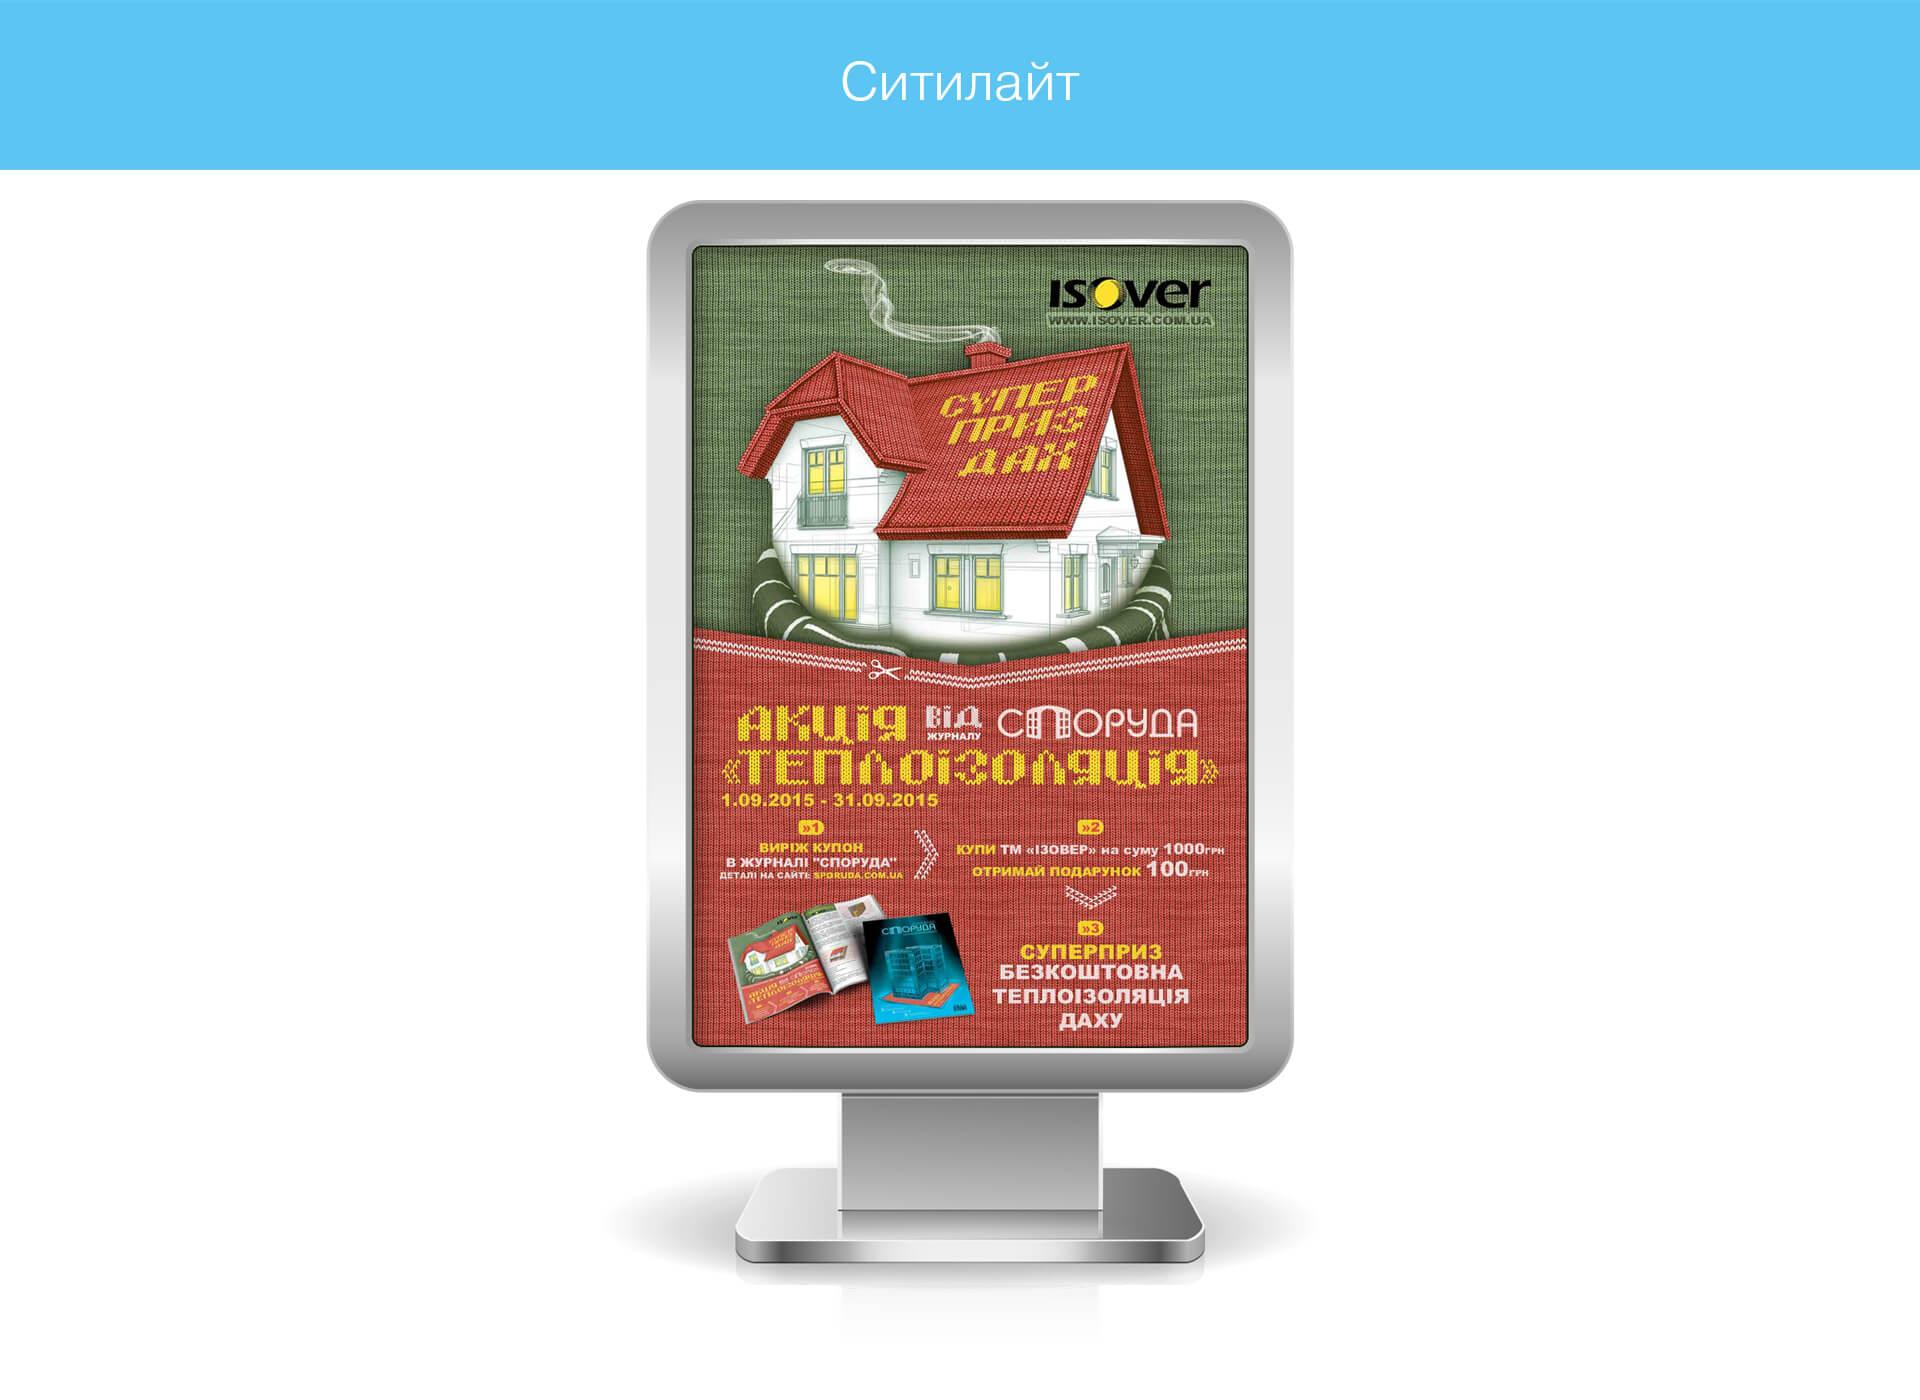 Prokochuk_Irina_architectural magazine Sporuda_аdvertising campaign_5